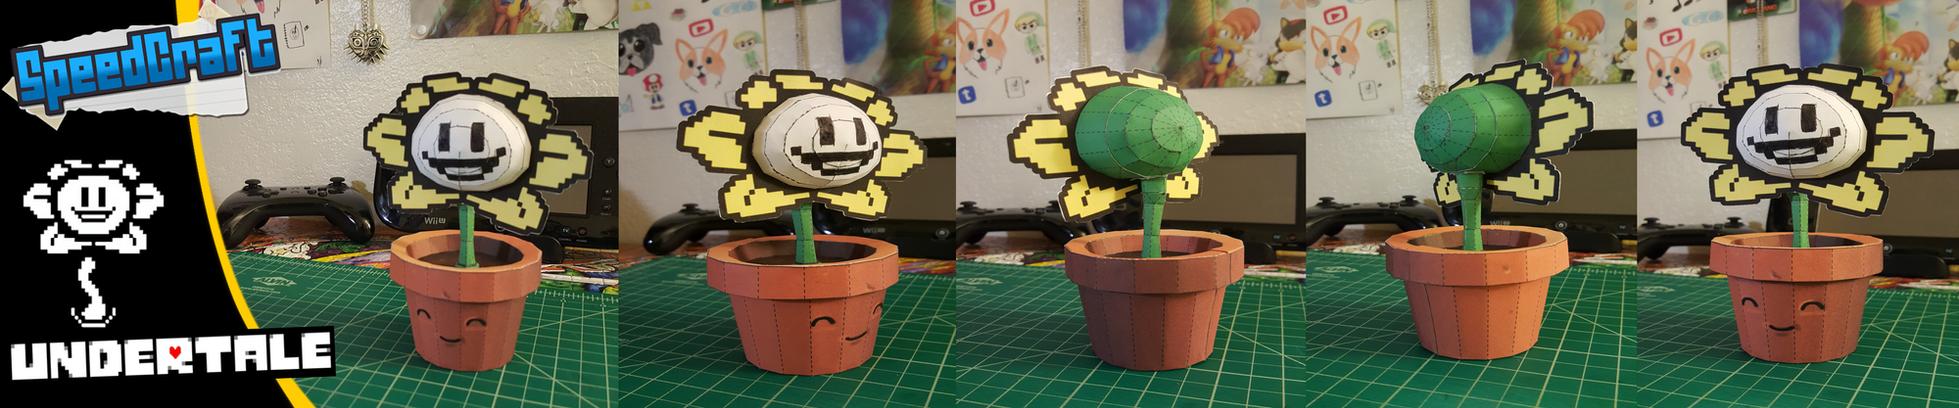 Undertale Papercraft ~ Flowey the Flower~ by SuperRetroBro